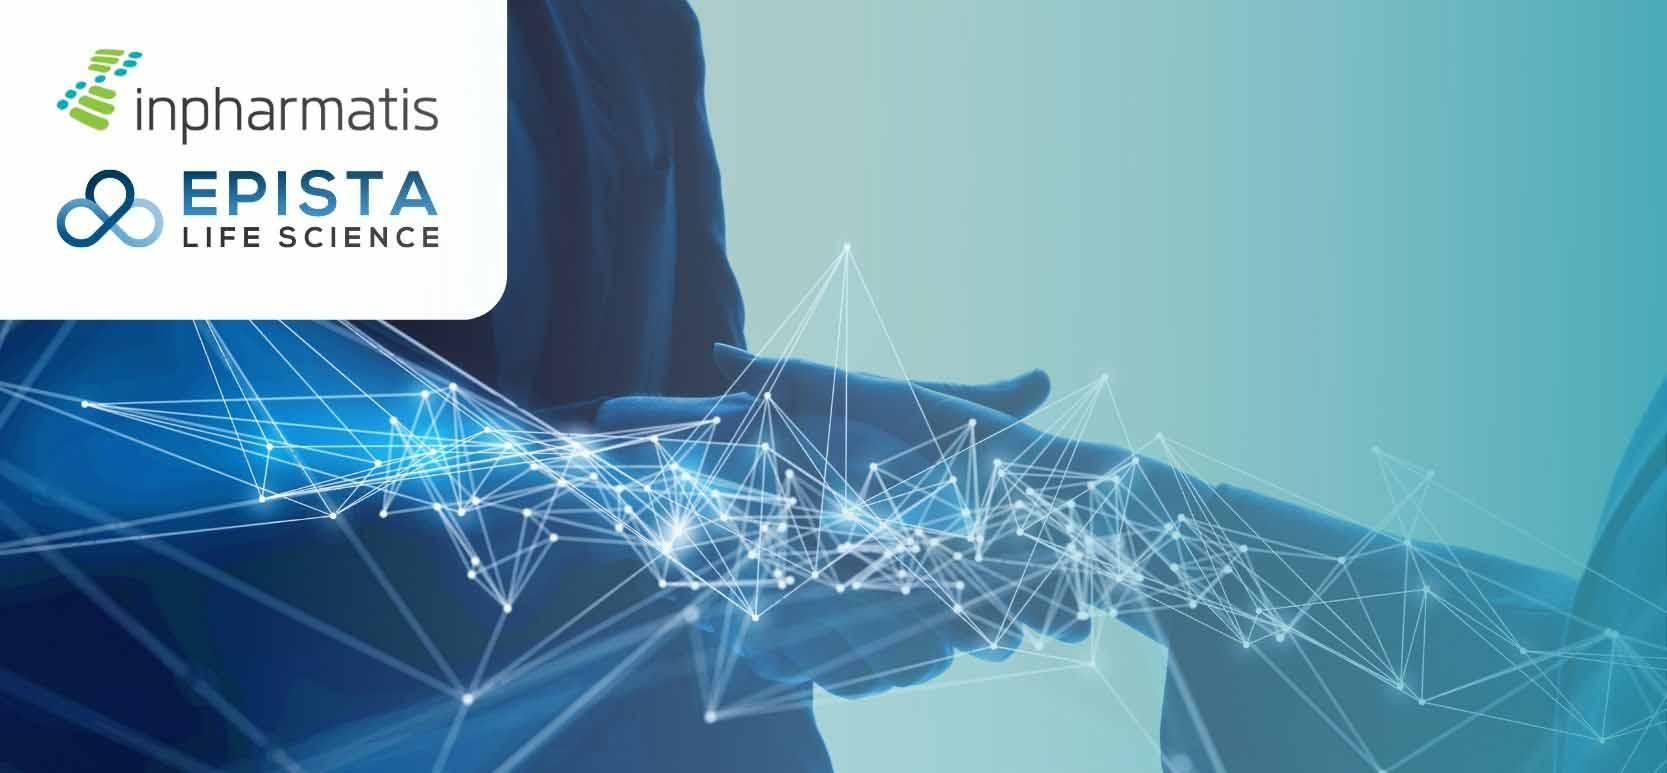 Inpharmatis & Epista Partnership Announcement